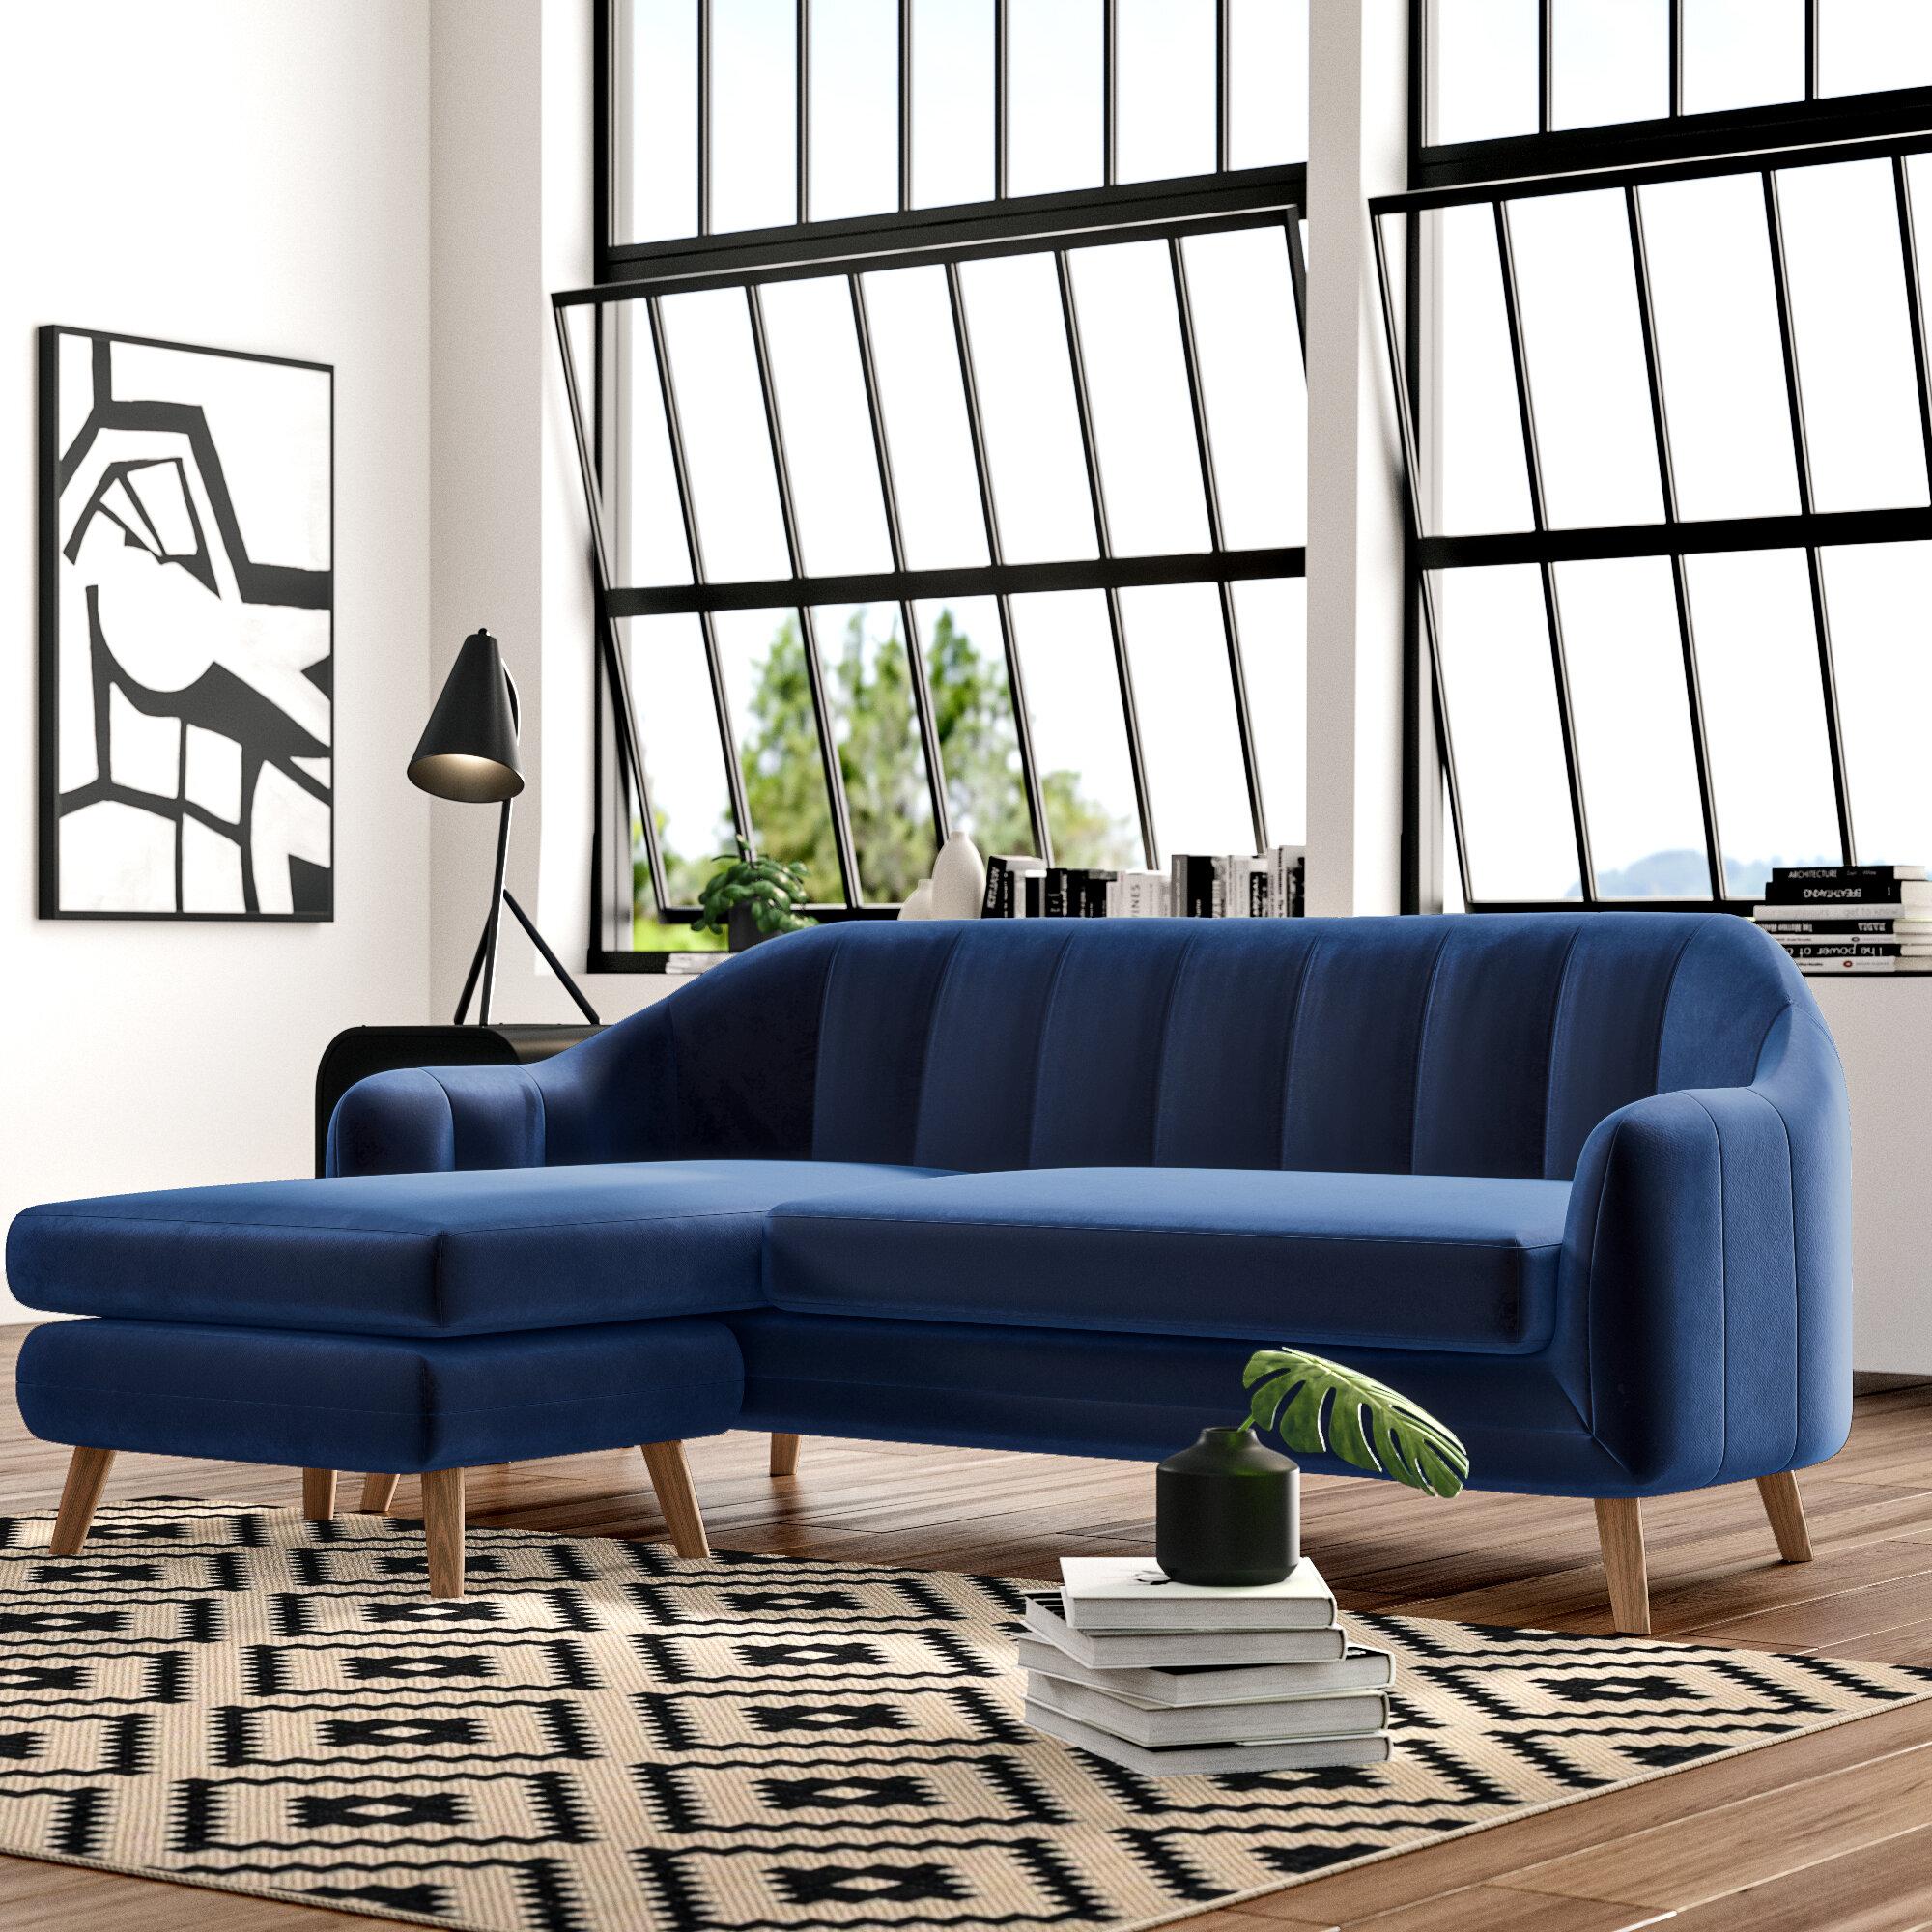 Enjoyable Desmond Reversible Sectional Creativecarmelina Interior Chair Design Creativecarmelinacom